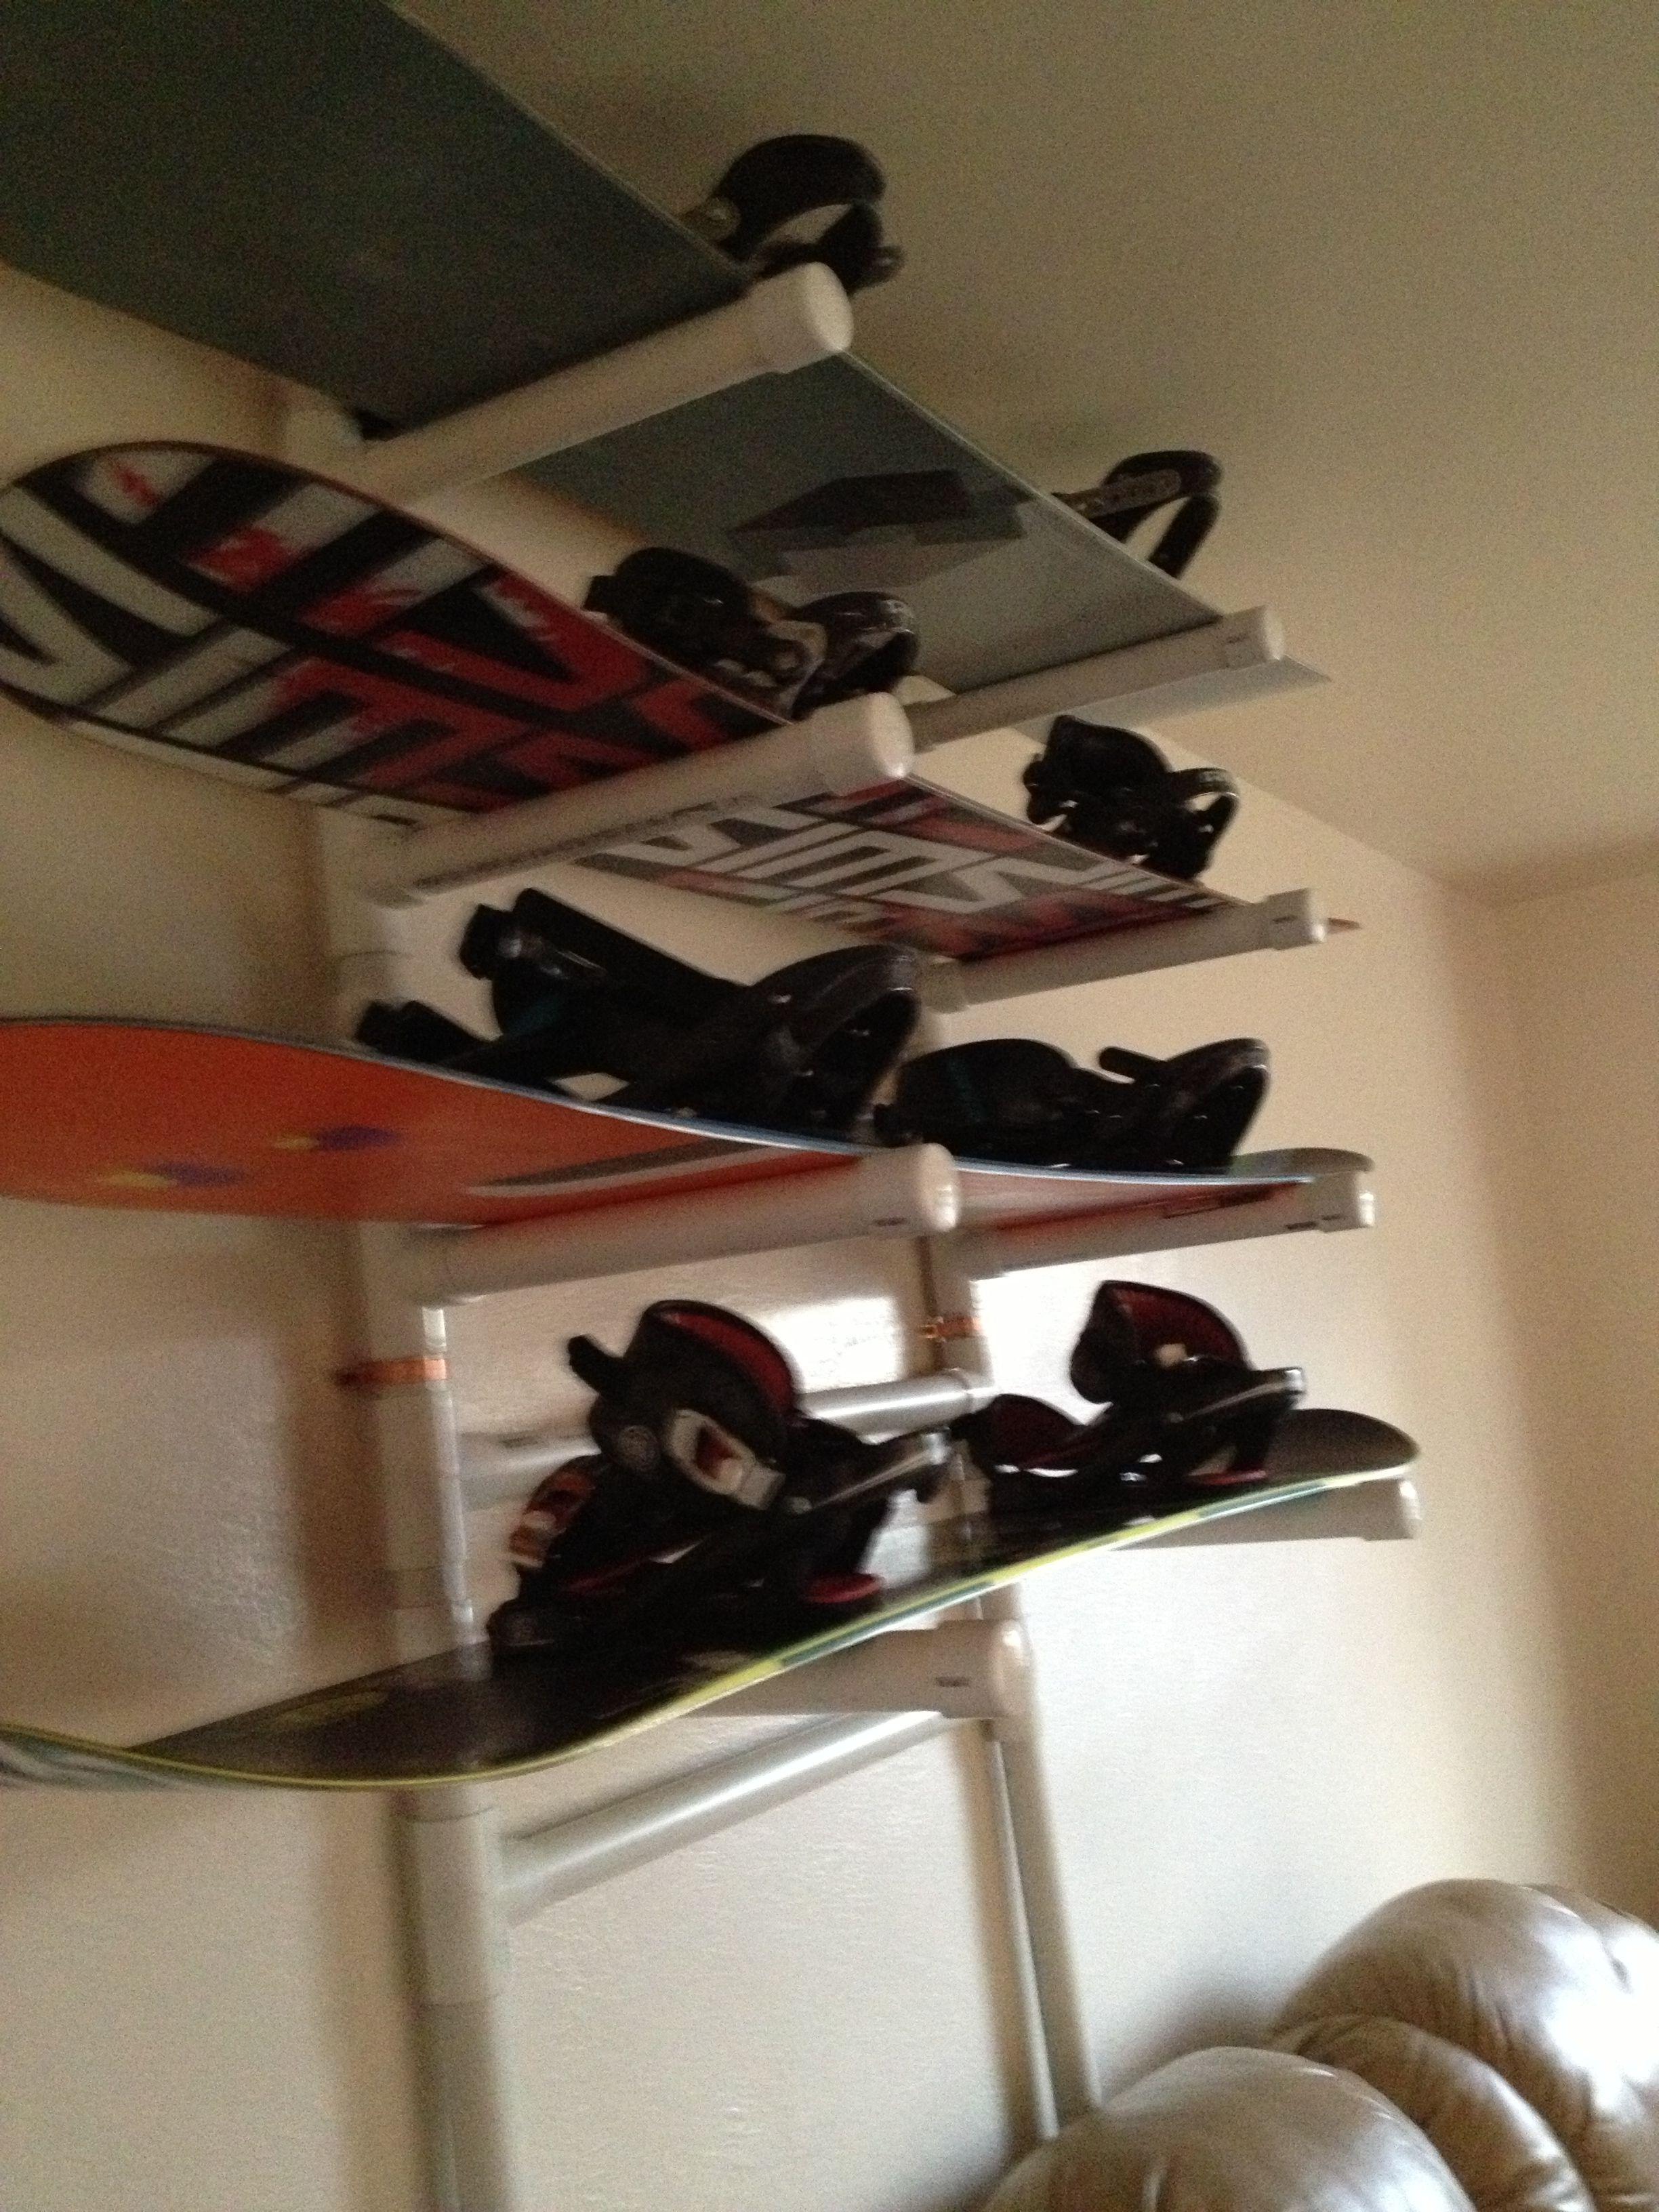 homemade snowboard rack snowboard garage organisation sports storage home organization. Black Bedroom Furniture Sets. Home Design Ideas